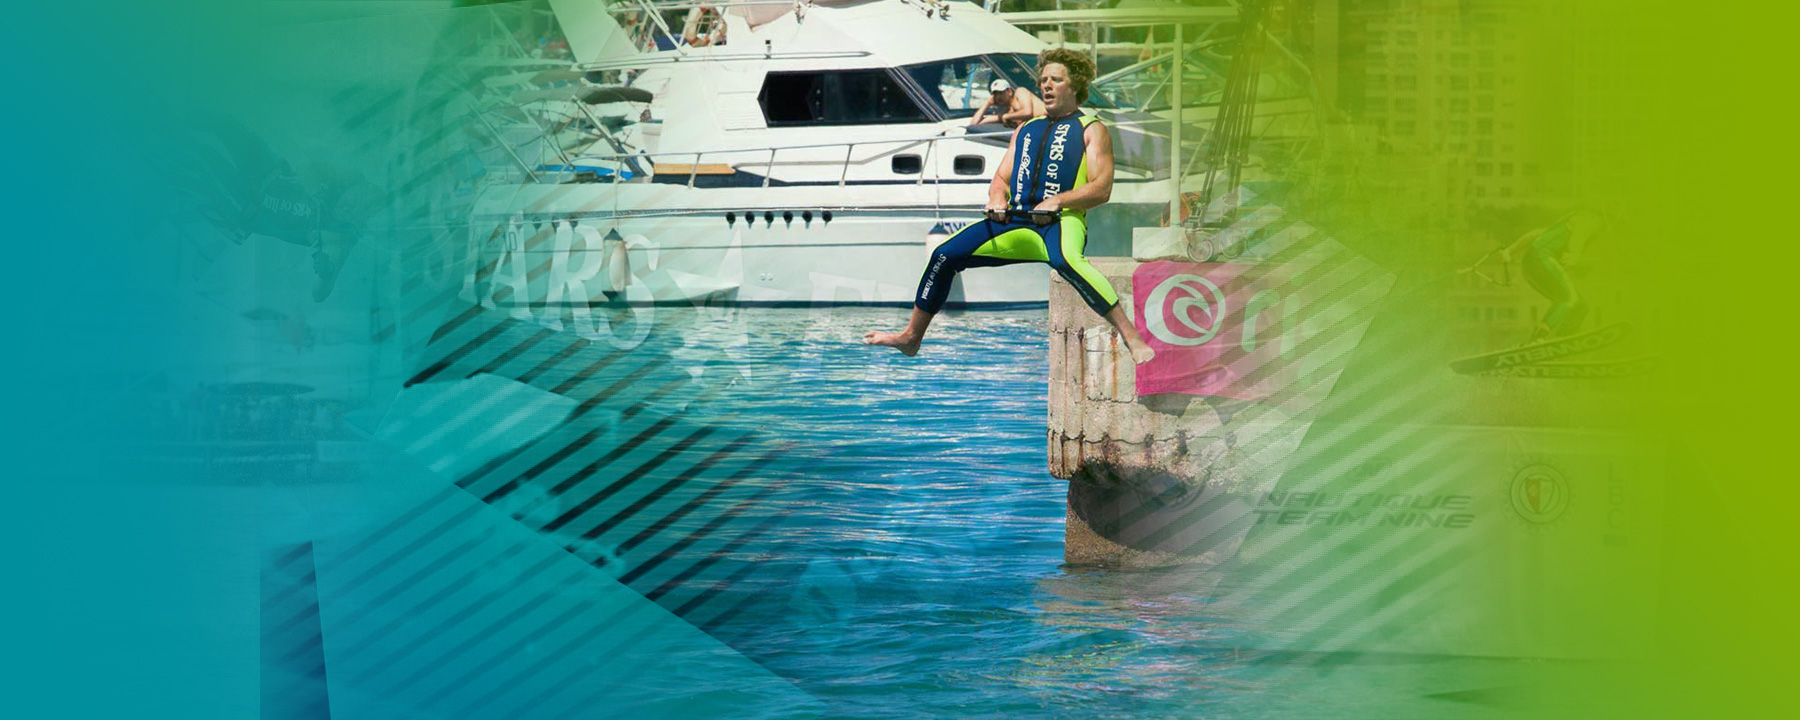 Water ski show Barefoot